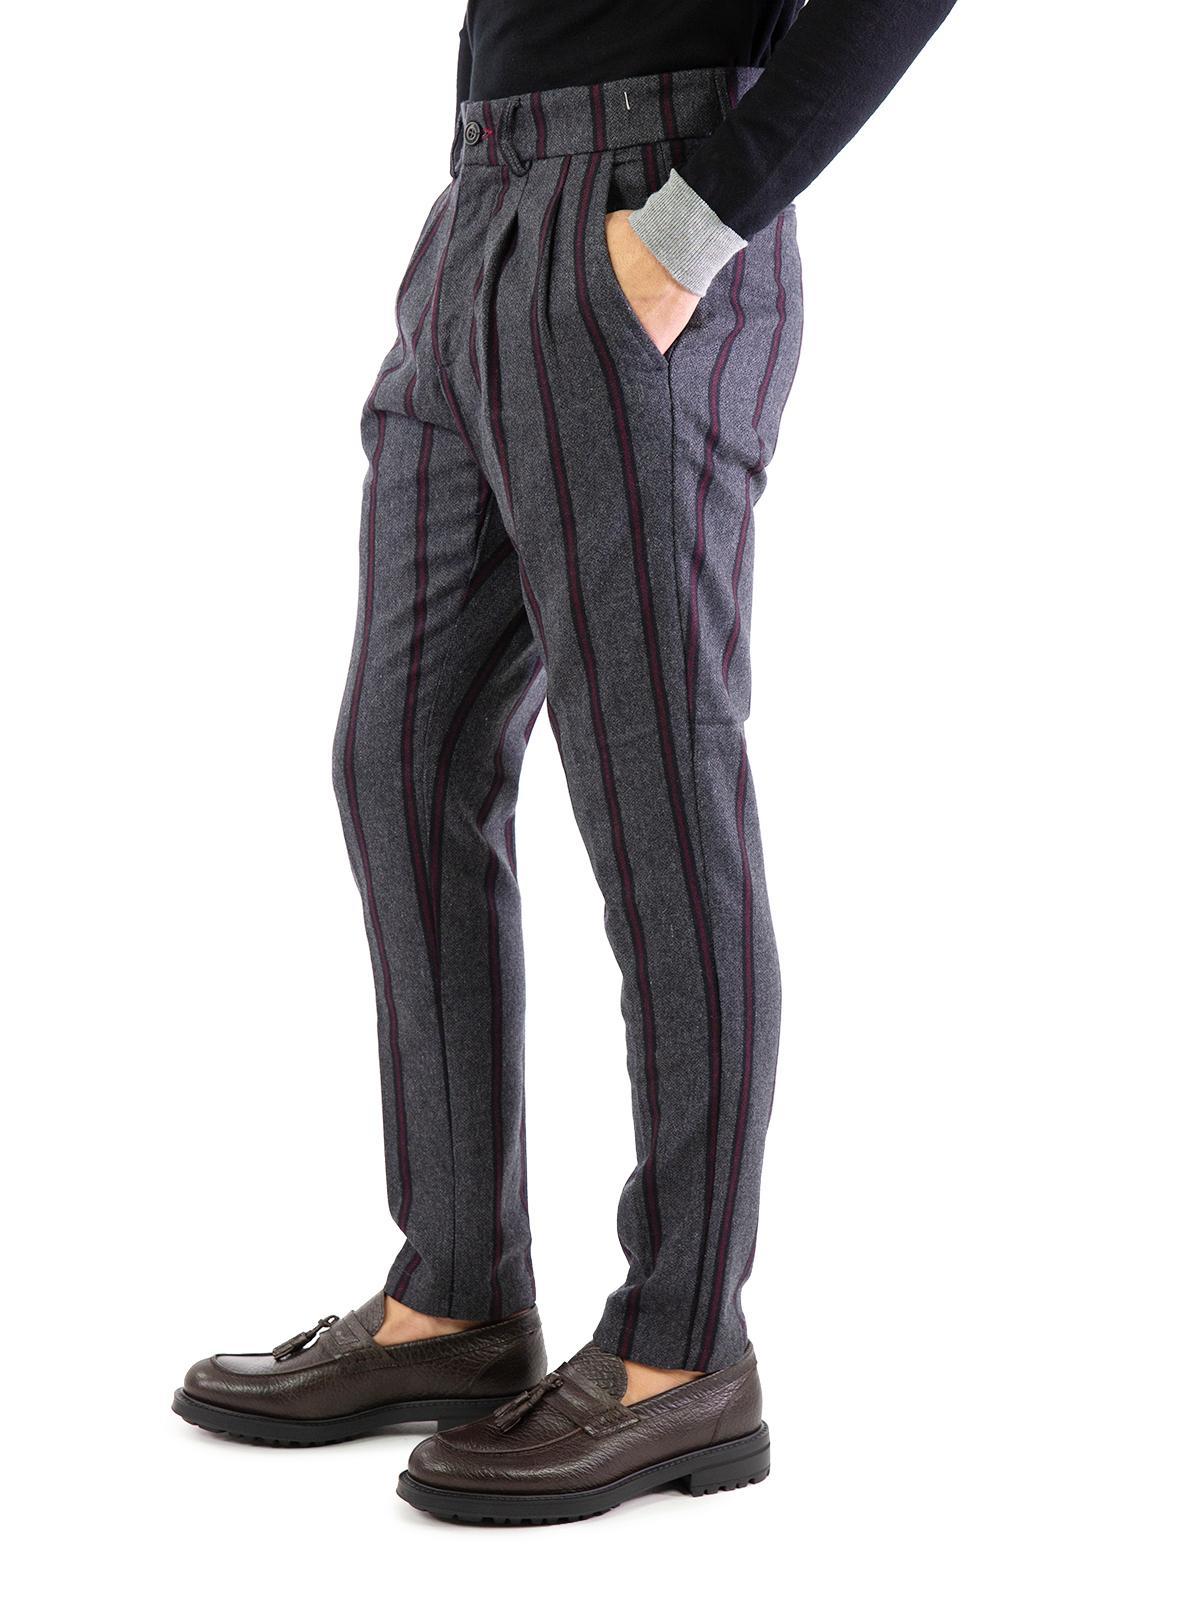 Trussardi Pantalone 52P00045 1T0015567